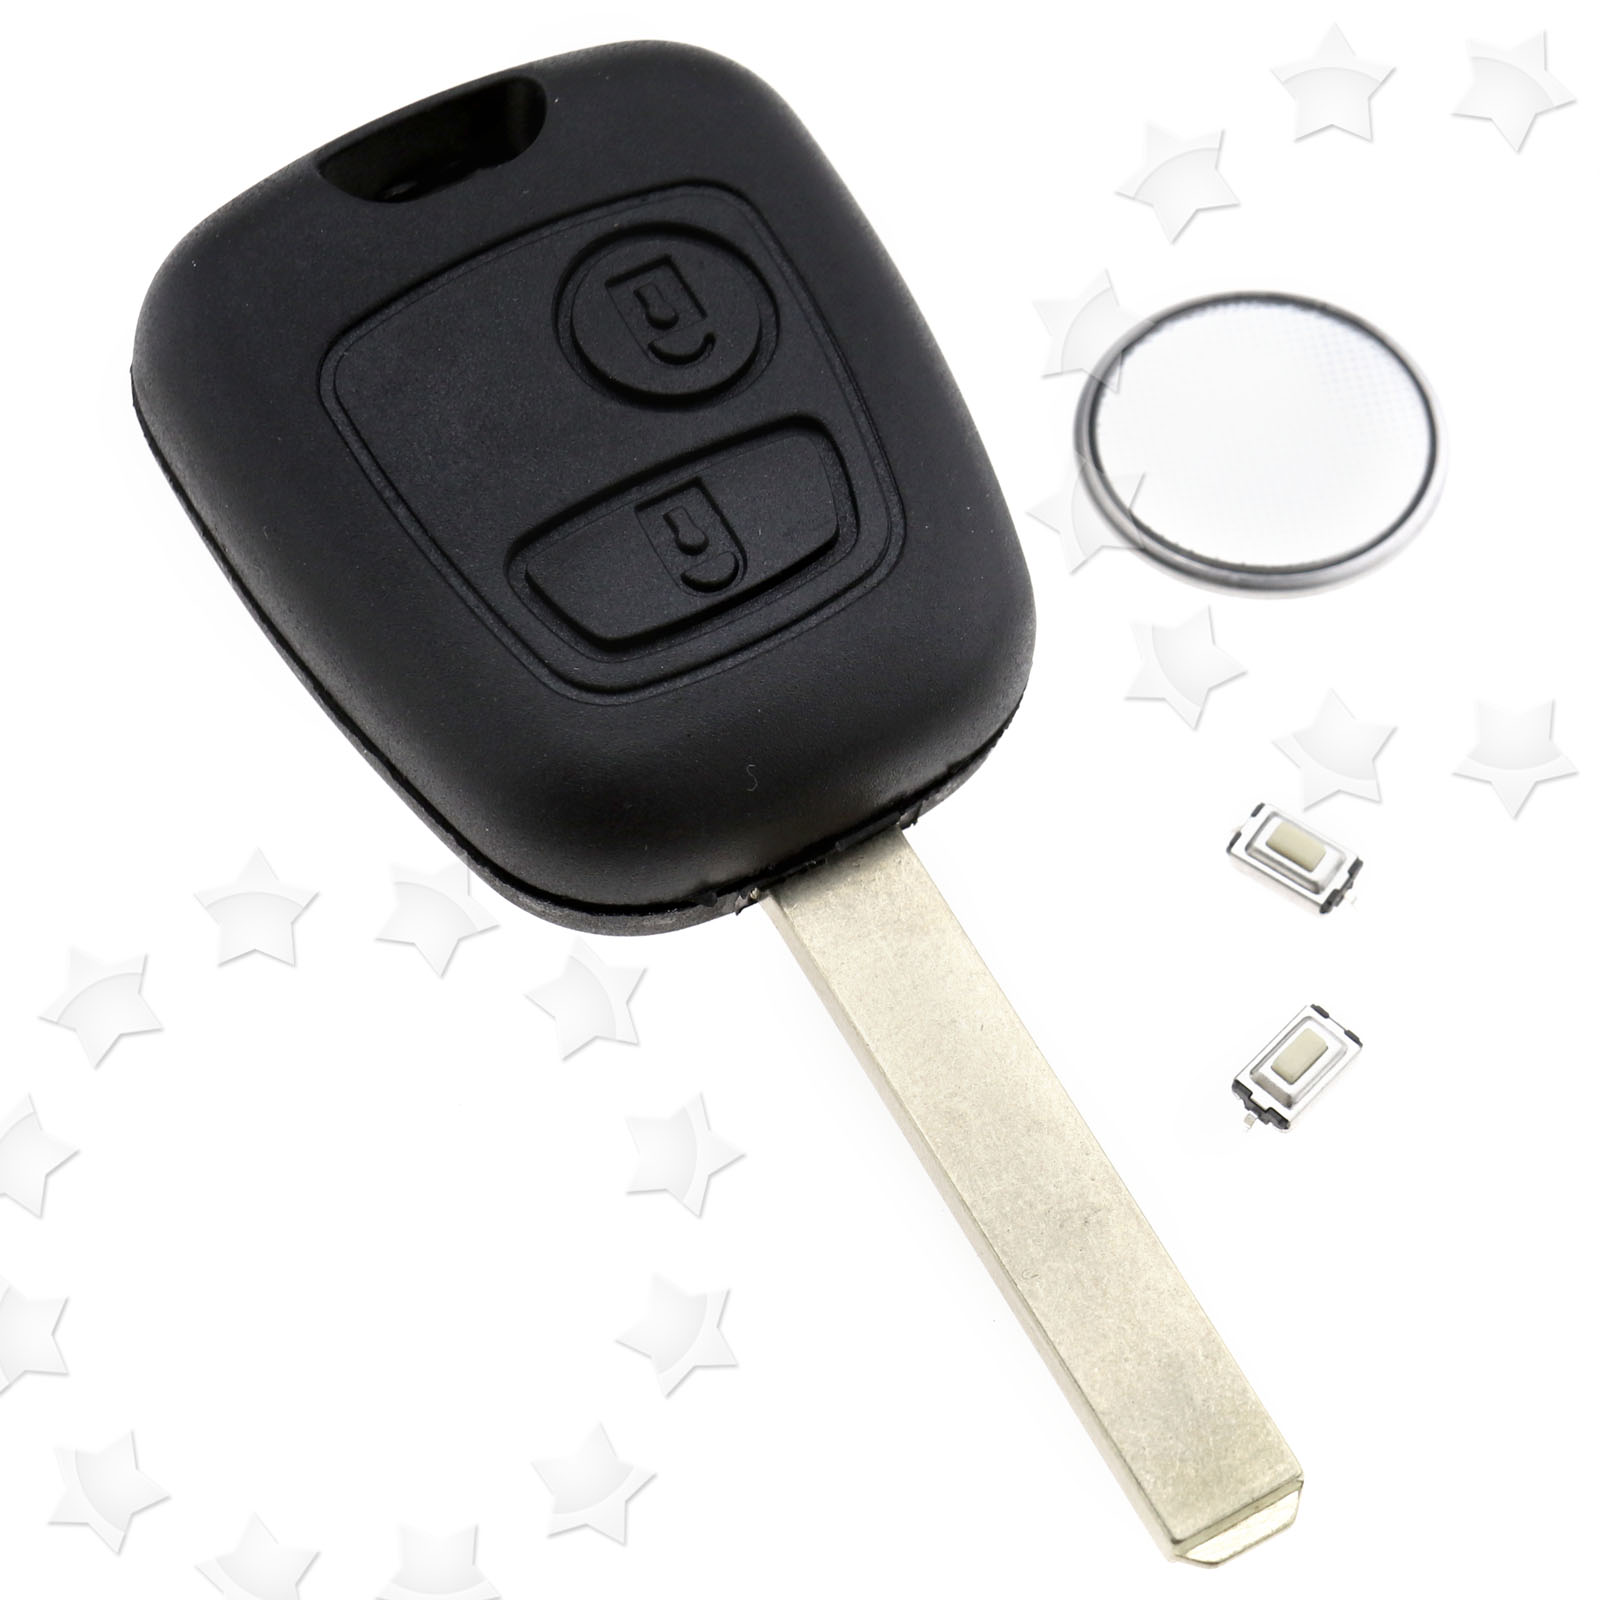 2 button remote key fob case shell for citroen c1 c2 w batteries ebay. Black Bedroom Furniture Sets. Home Design Ideas